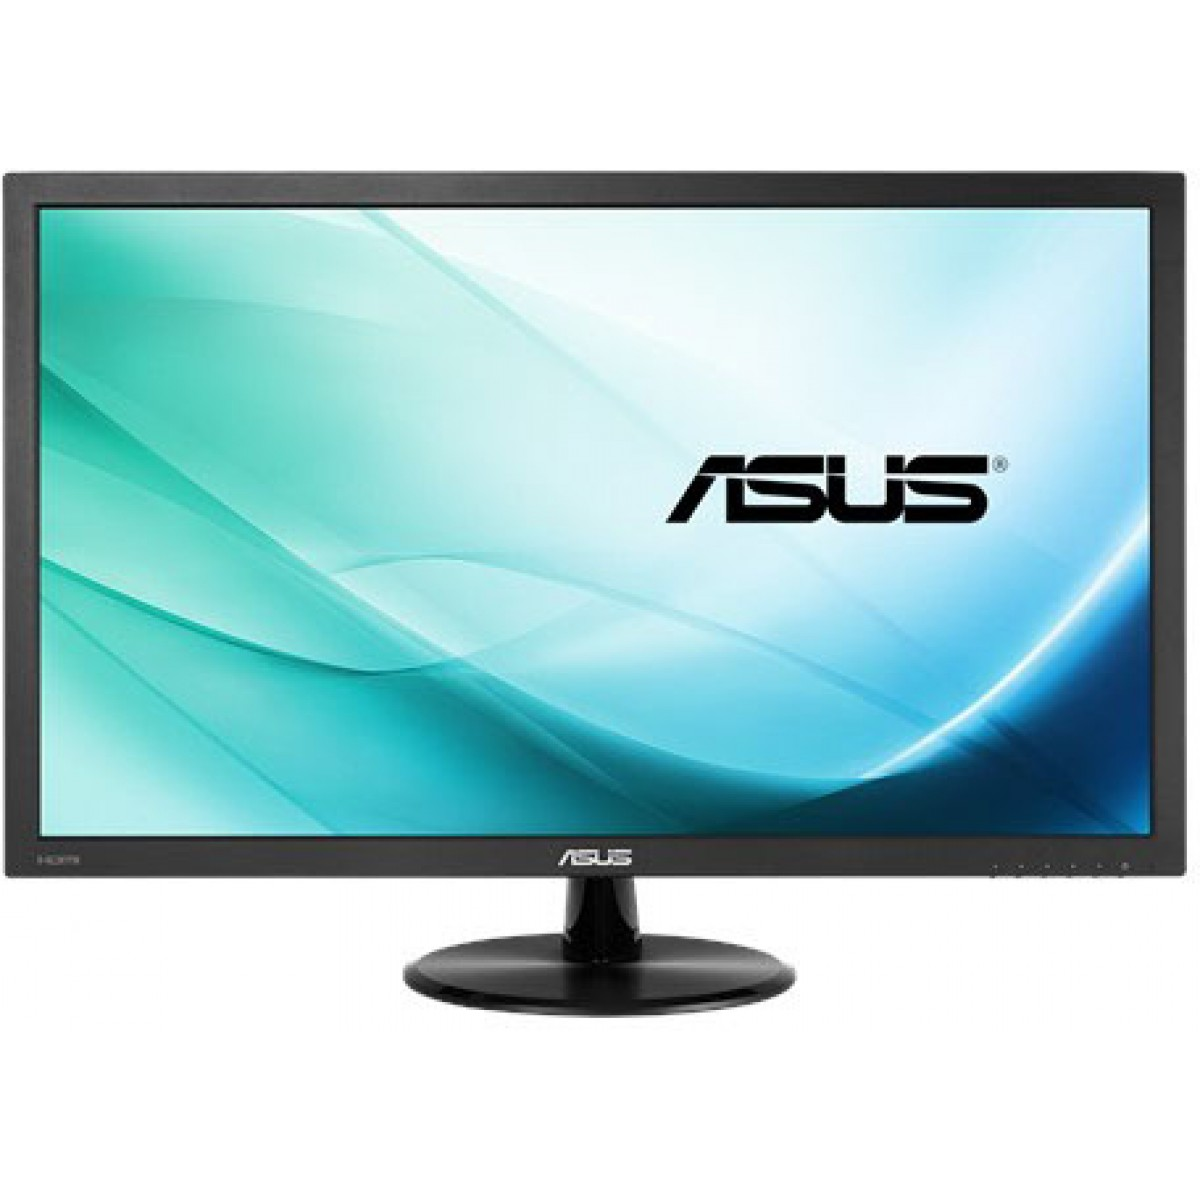 Monitor Gamer Asus 21,5 Pol, Full HD, 1ms, HDMI-VGA, VP228HE